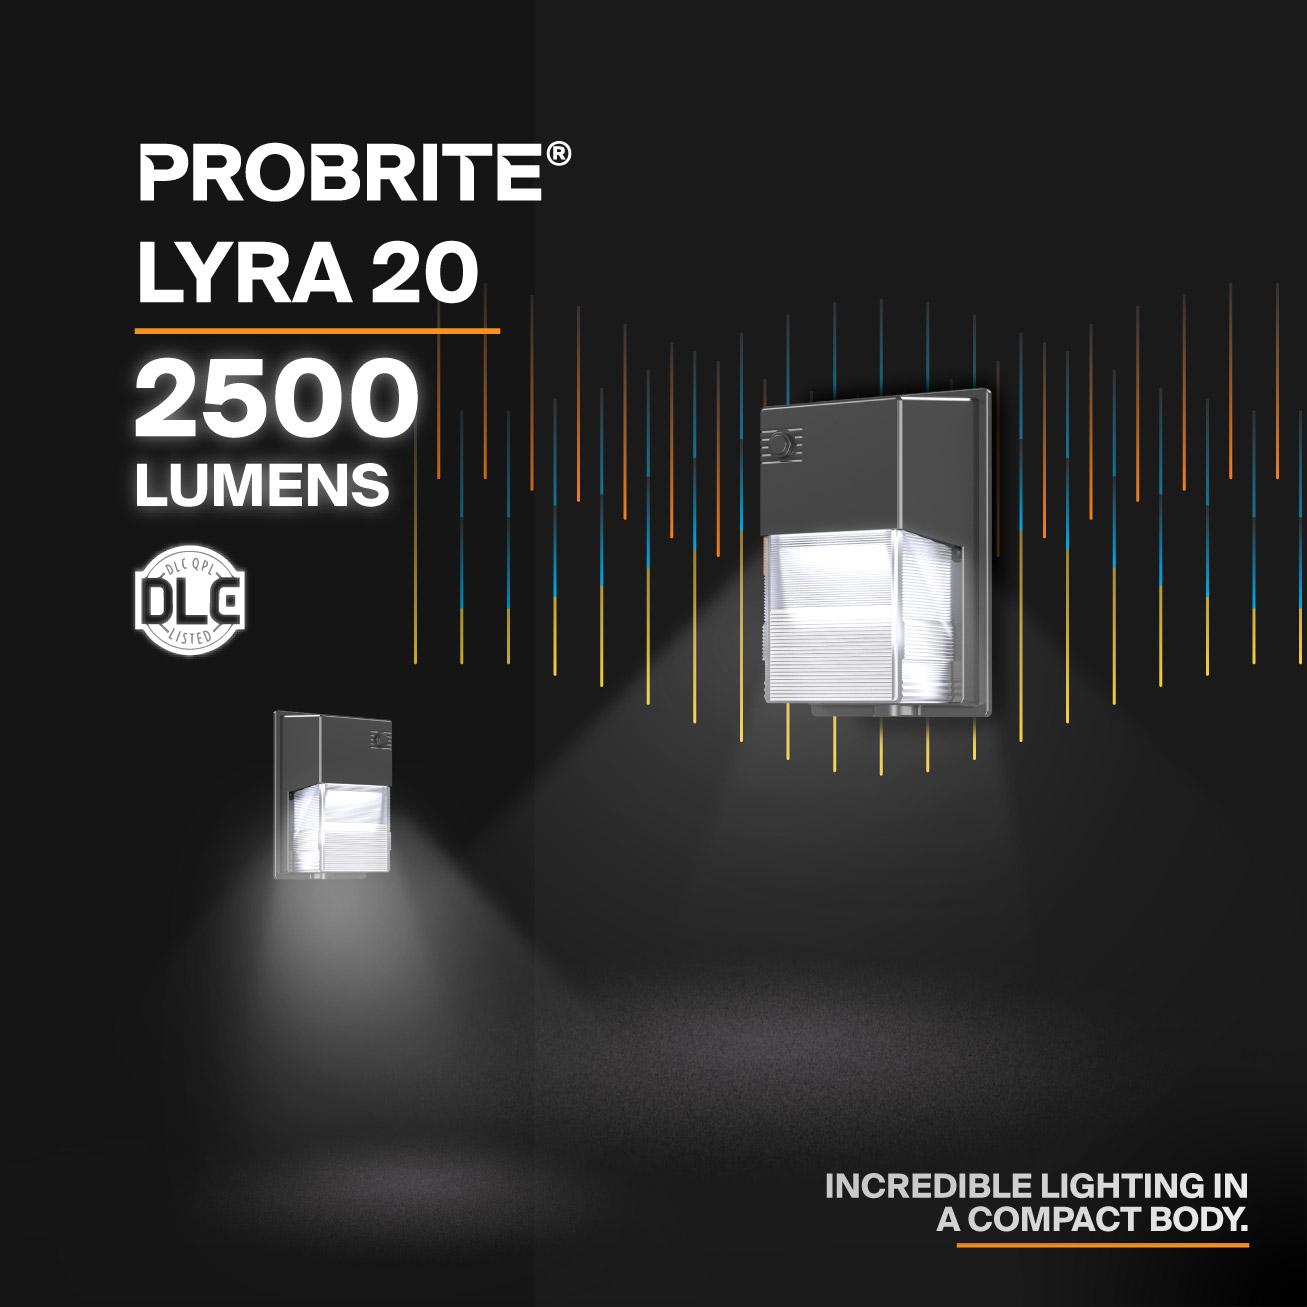 Probrite Lyra20 LED Wall Pack Incredible Lighting